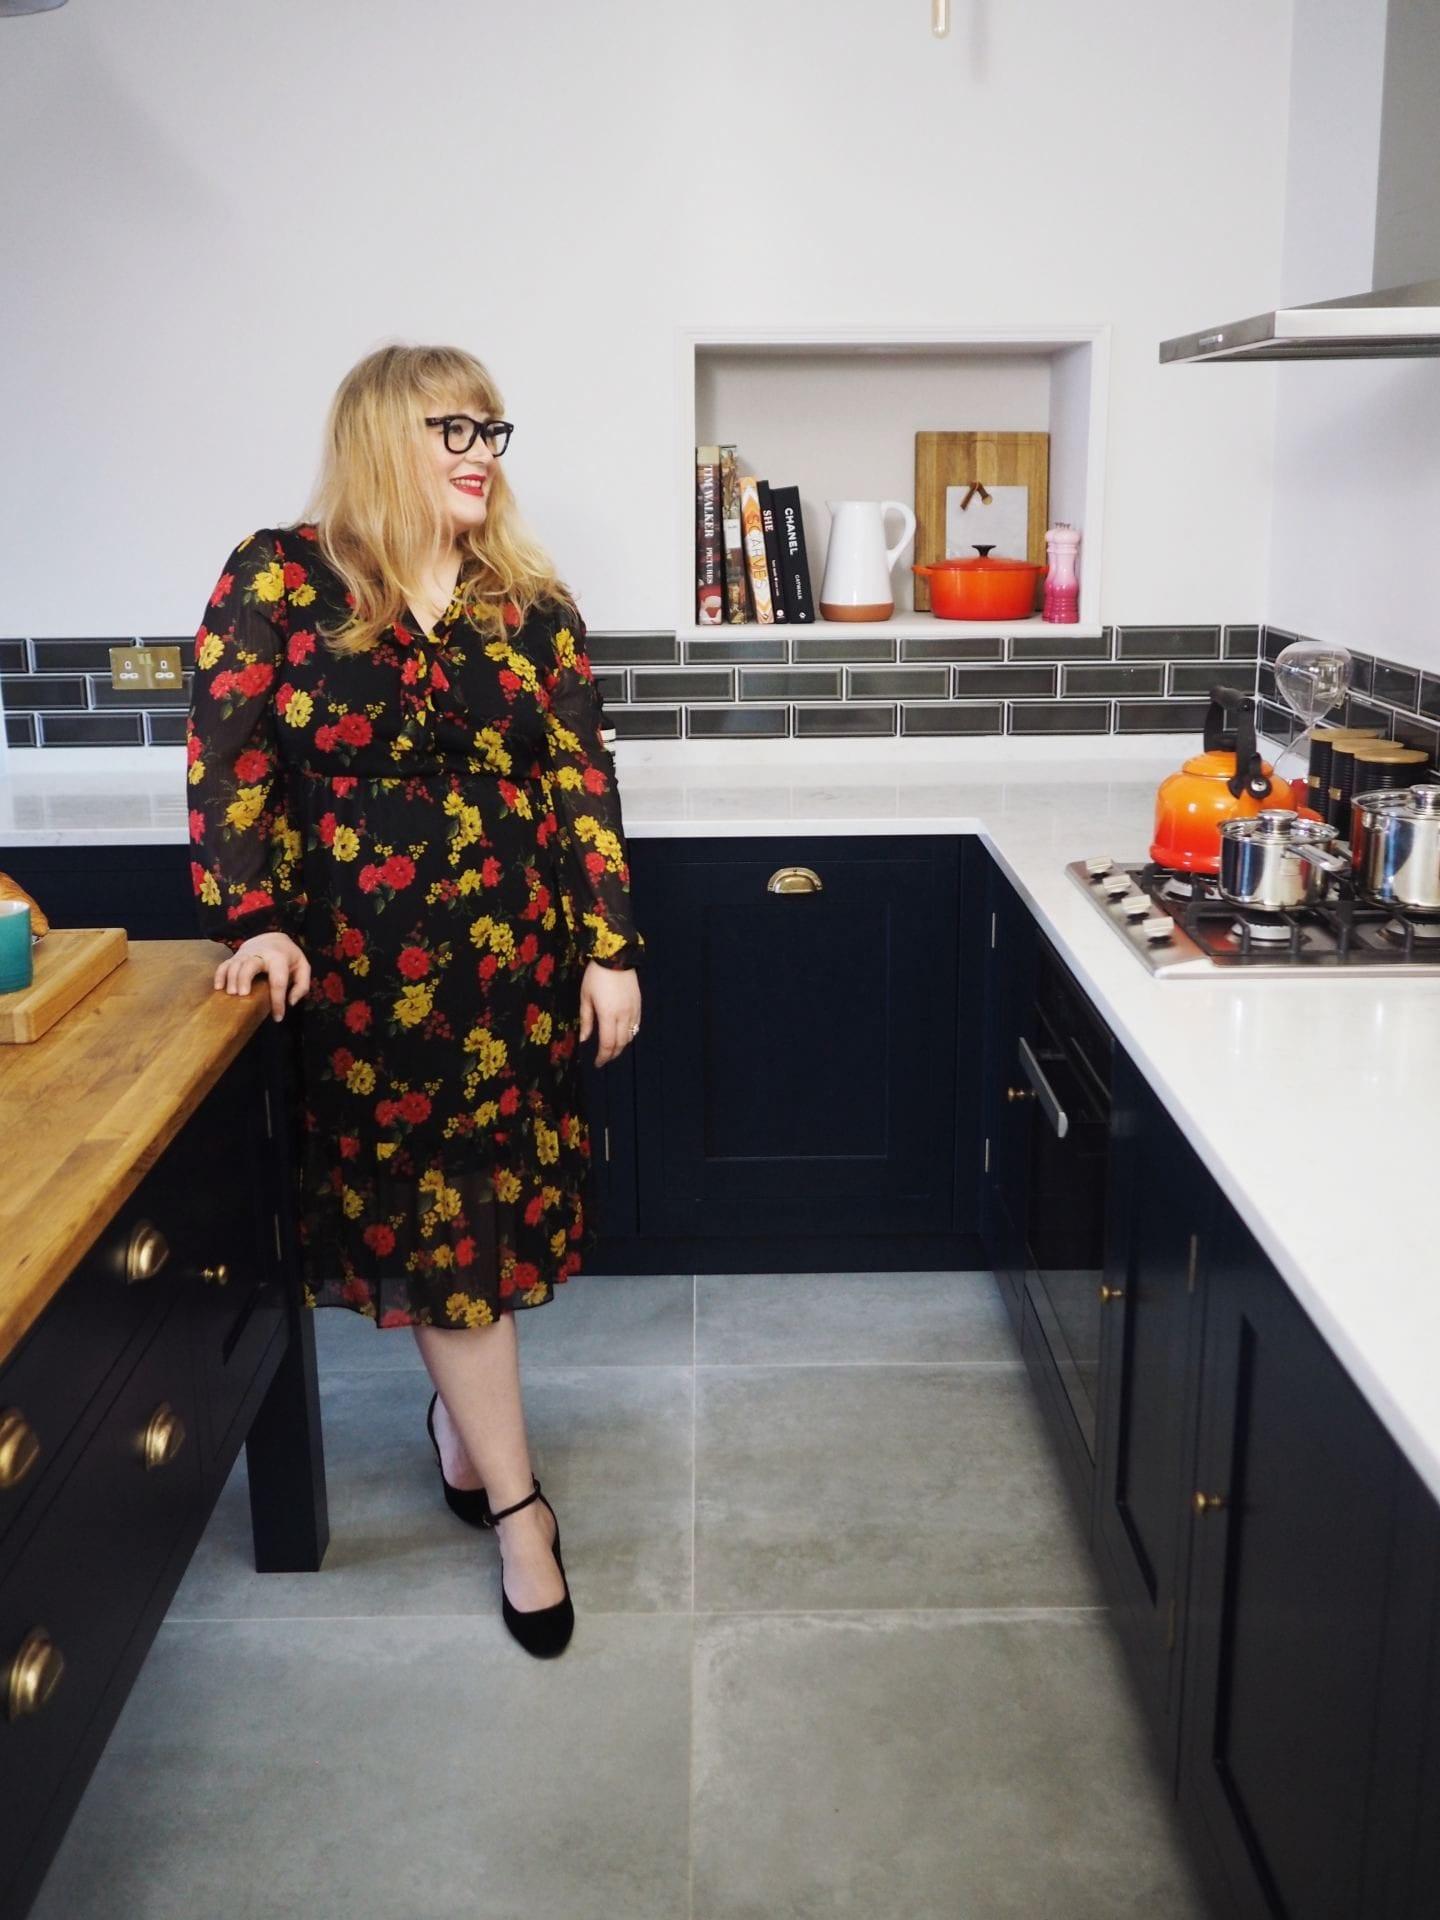 harvey jones kitchen navy blue fashion for lunch blog kitchen